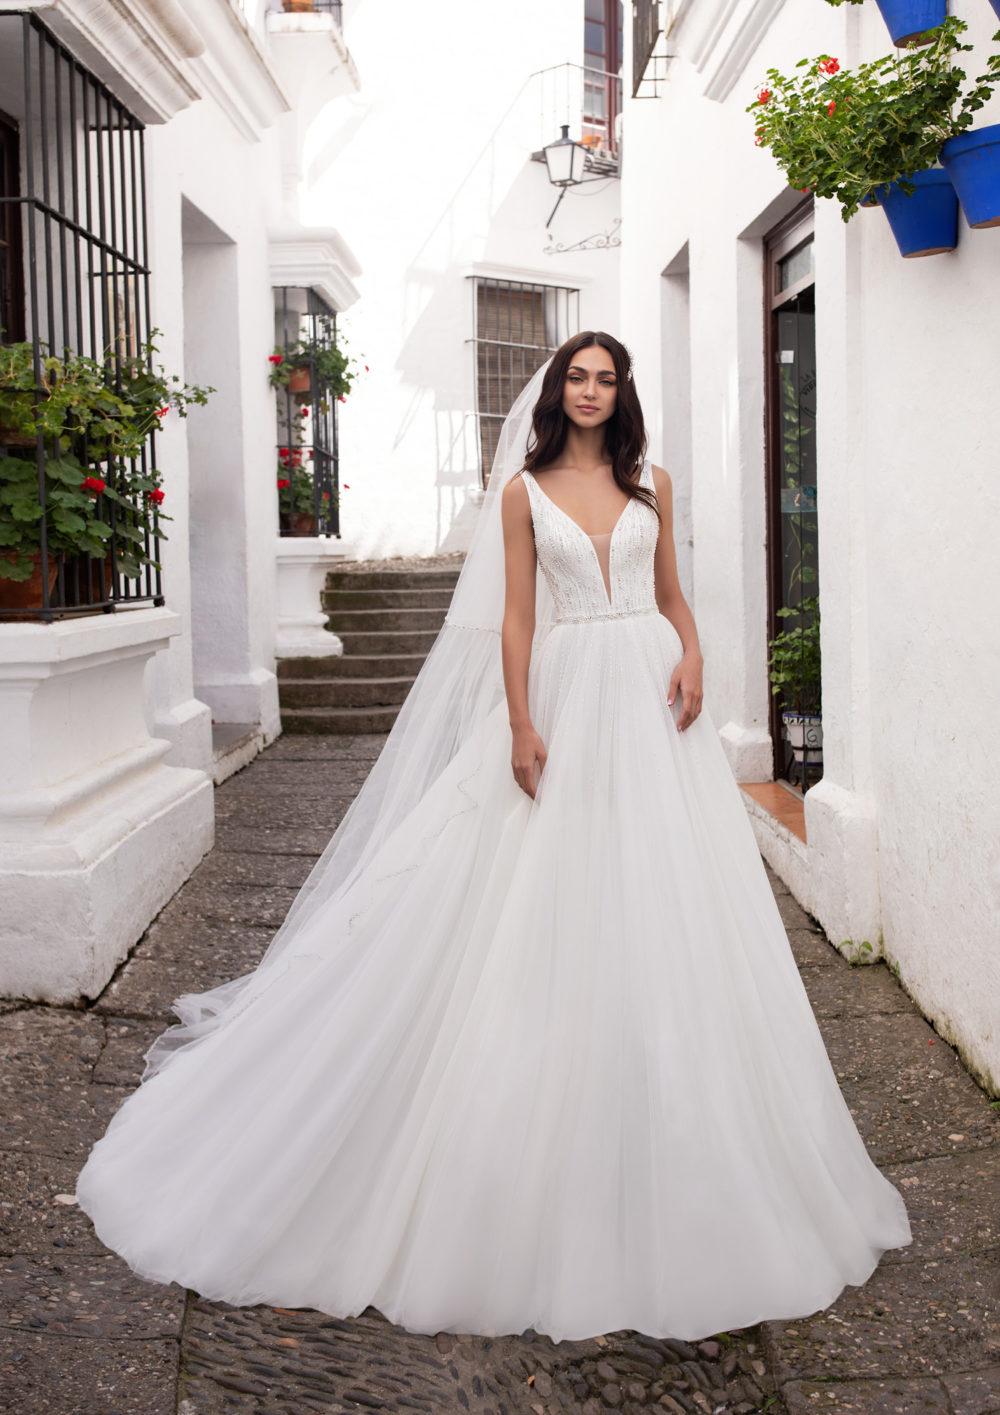 Mariages: abito da sposa Pronovias 2020 a Vicenza, Verona, Padova, Veneto ADRASTEA